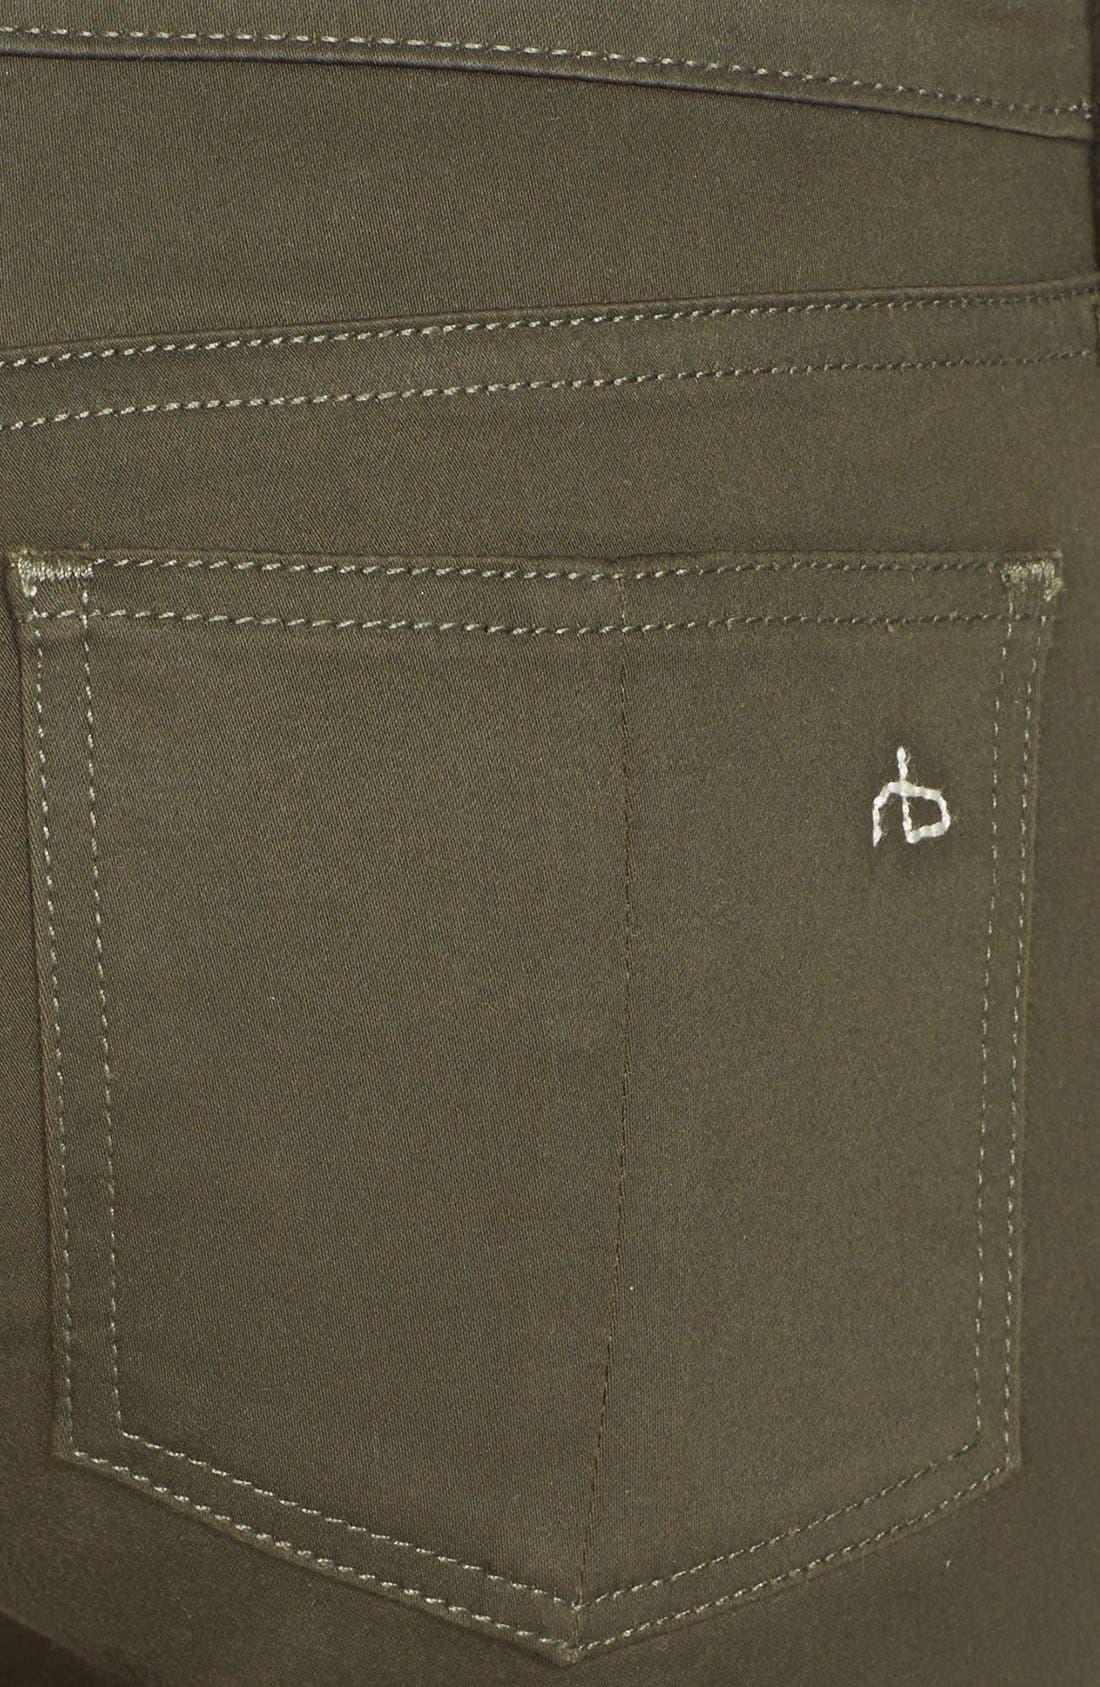 Alternate Image 3  - rag & bone/JEAN 'The Legging' Sateen Skinny Jeans (Army Sateen)